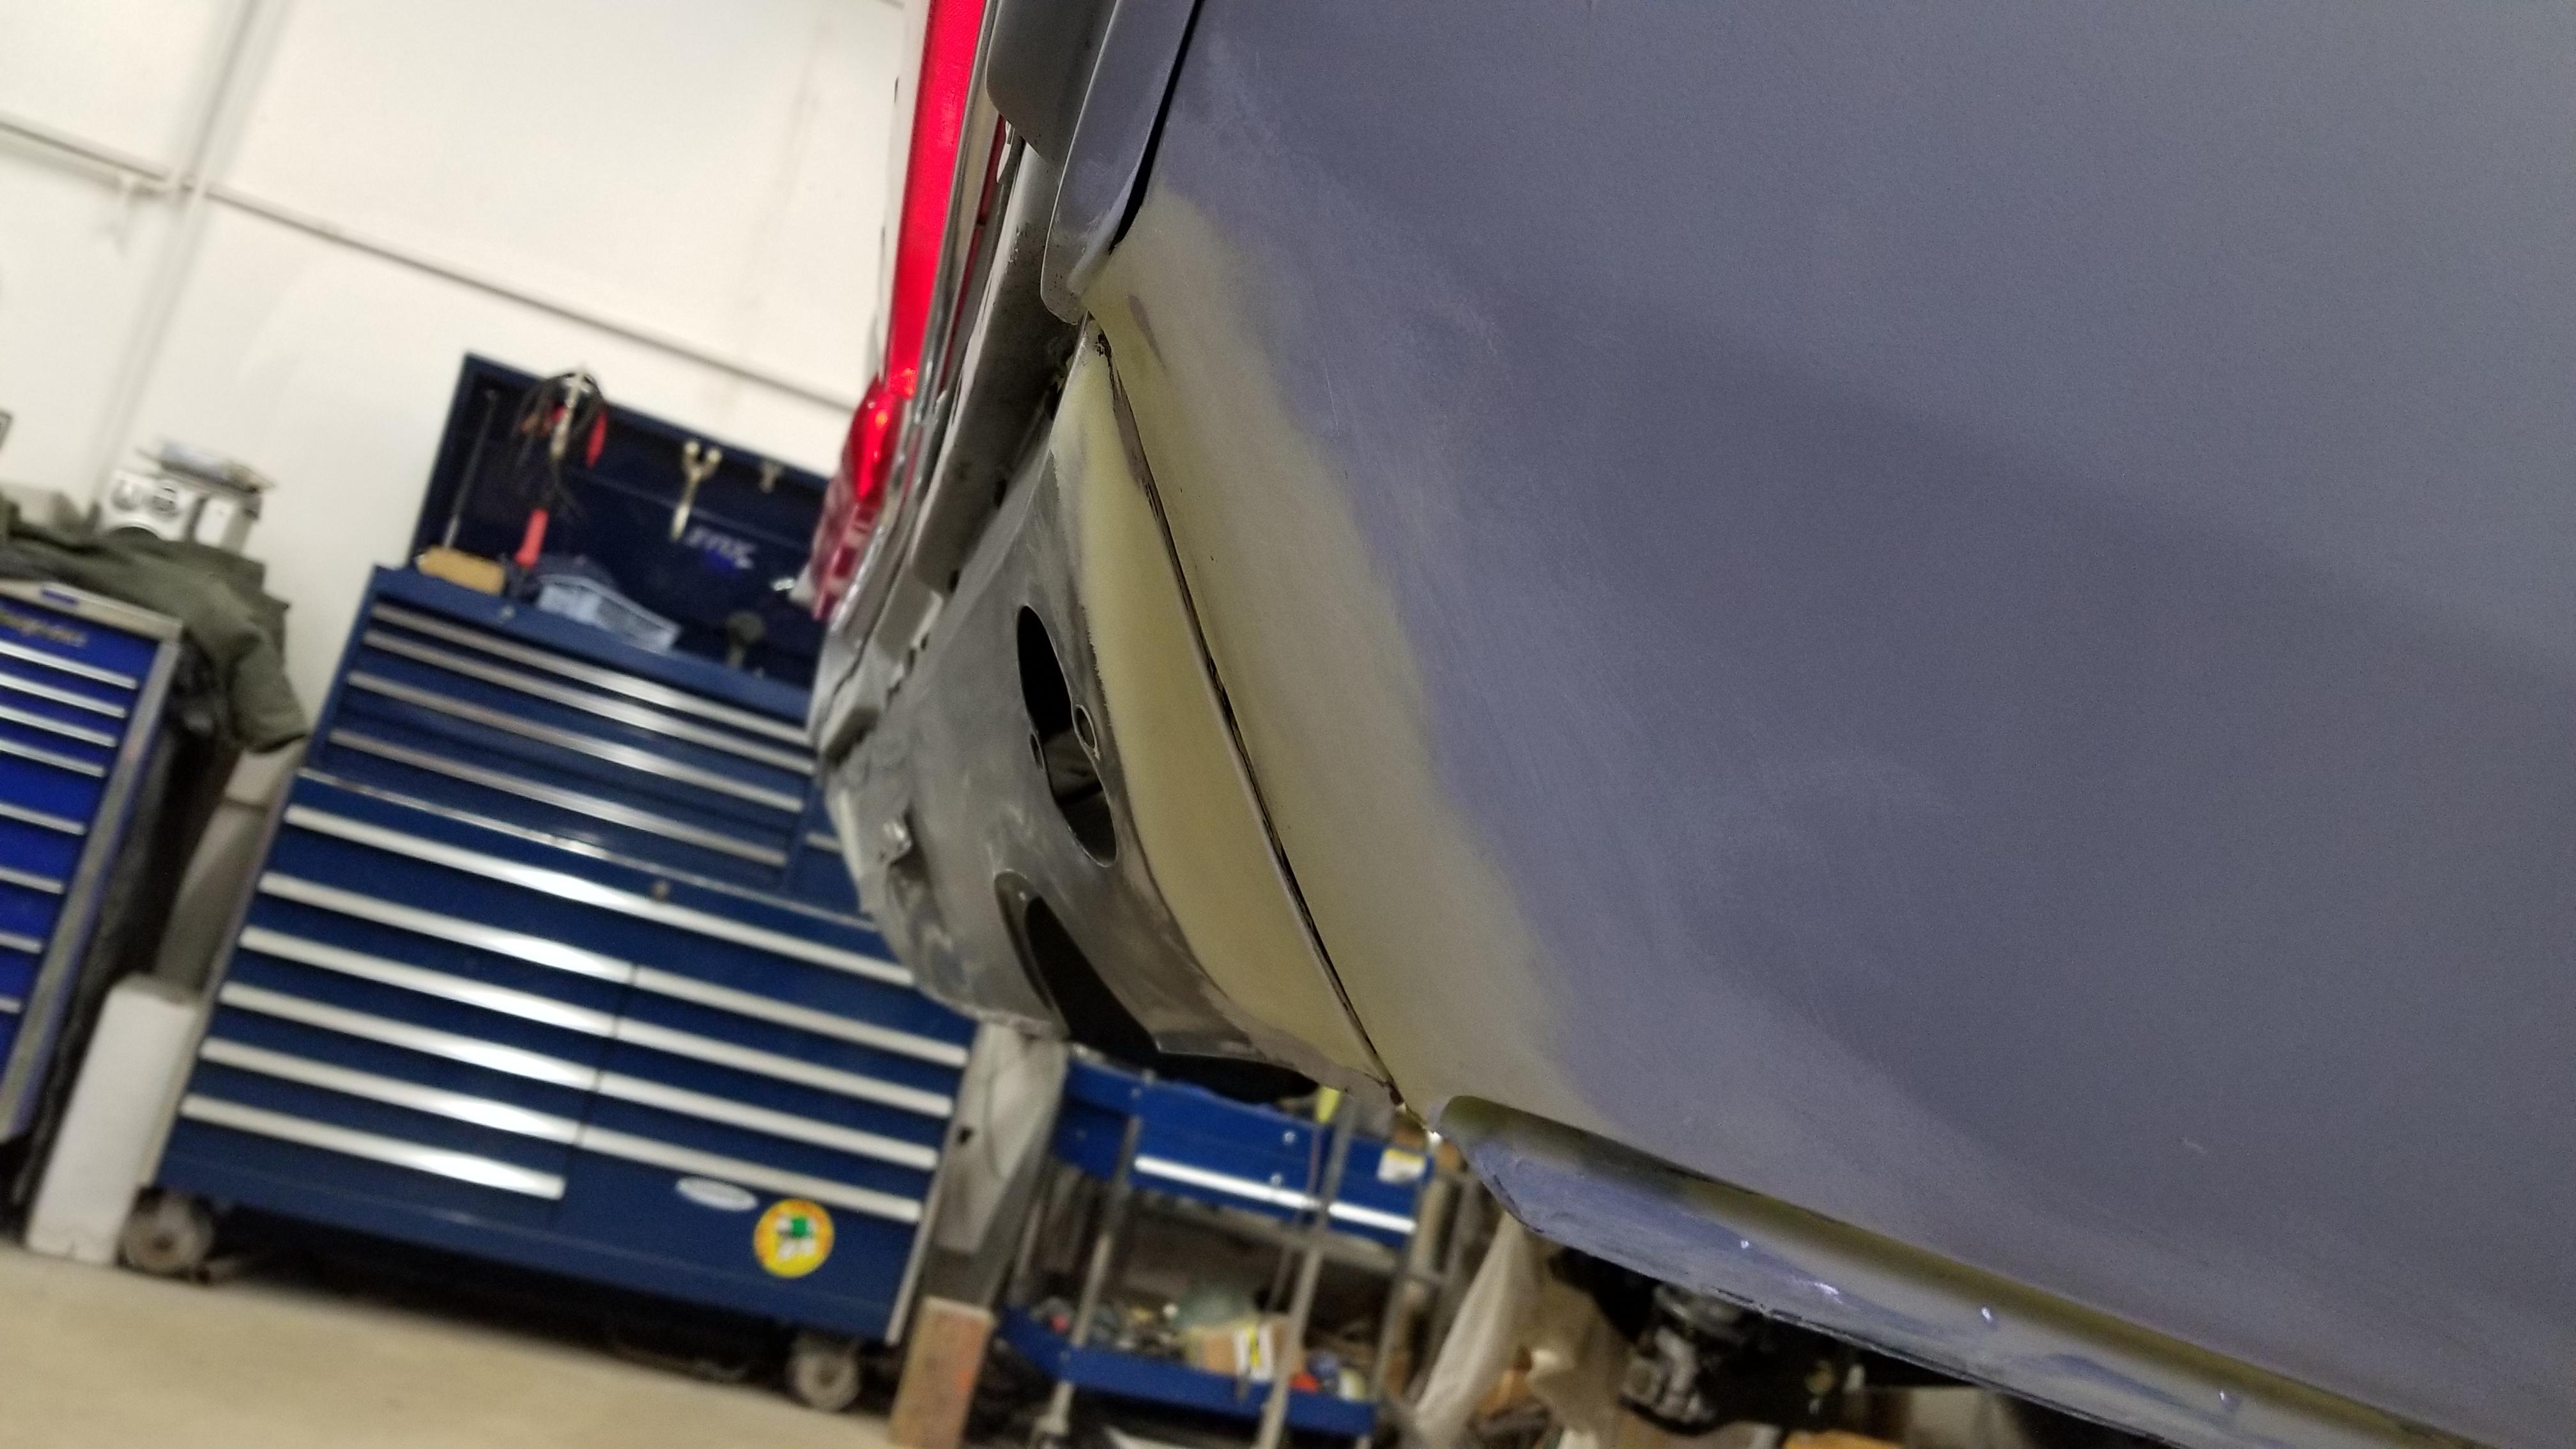 1967 Mustang Rear Valance gaps